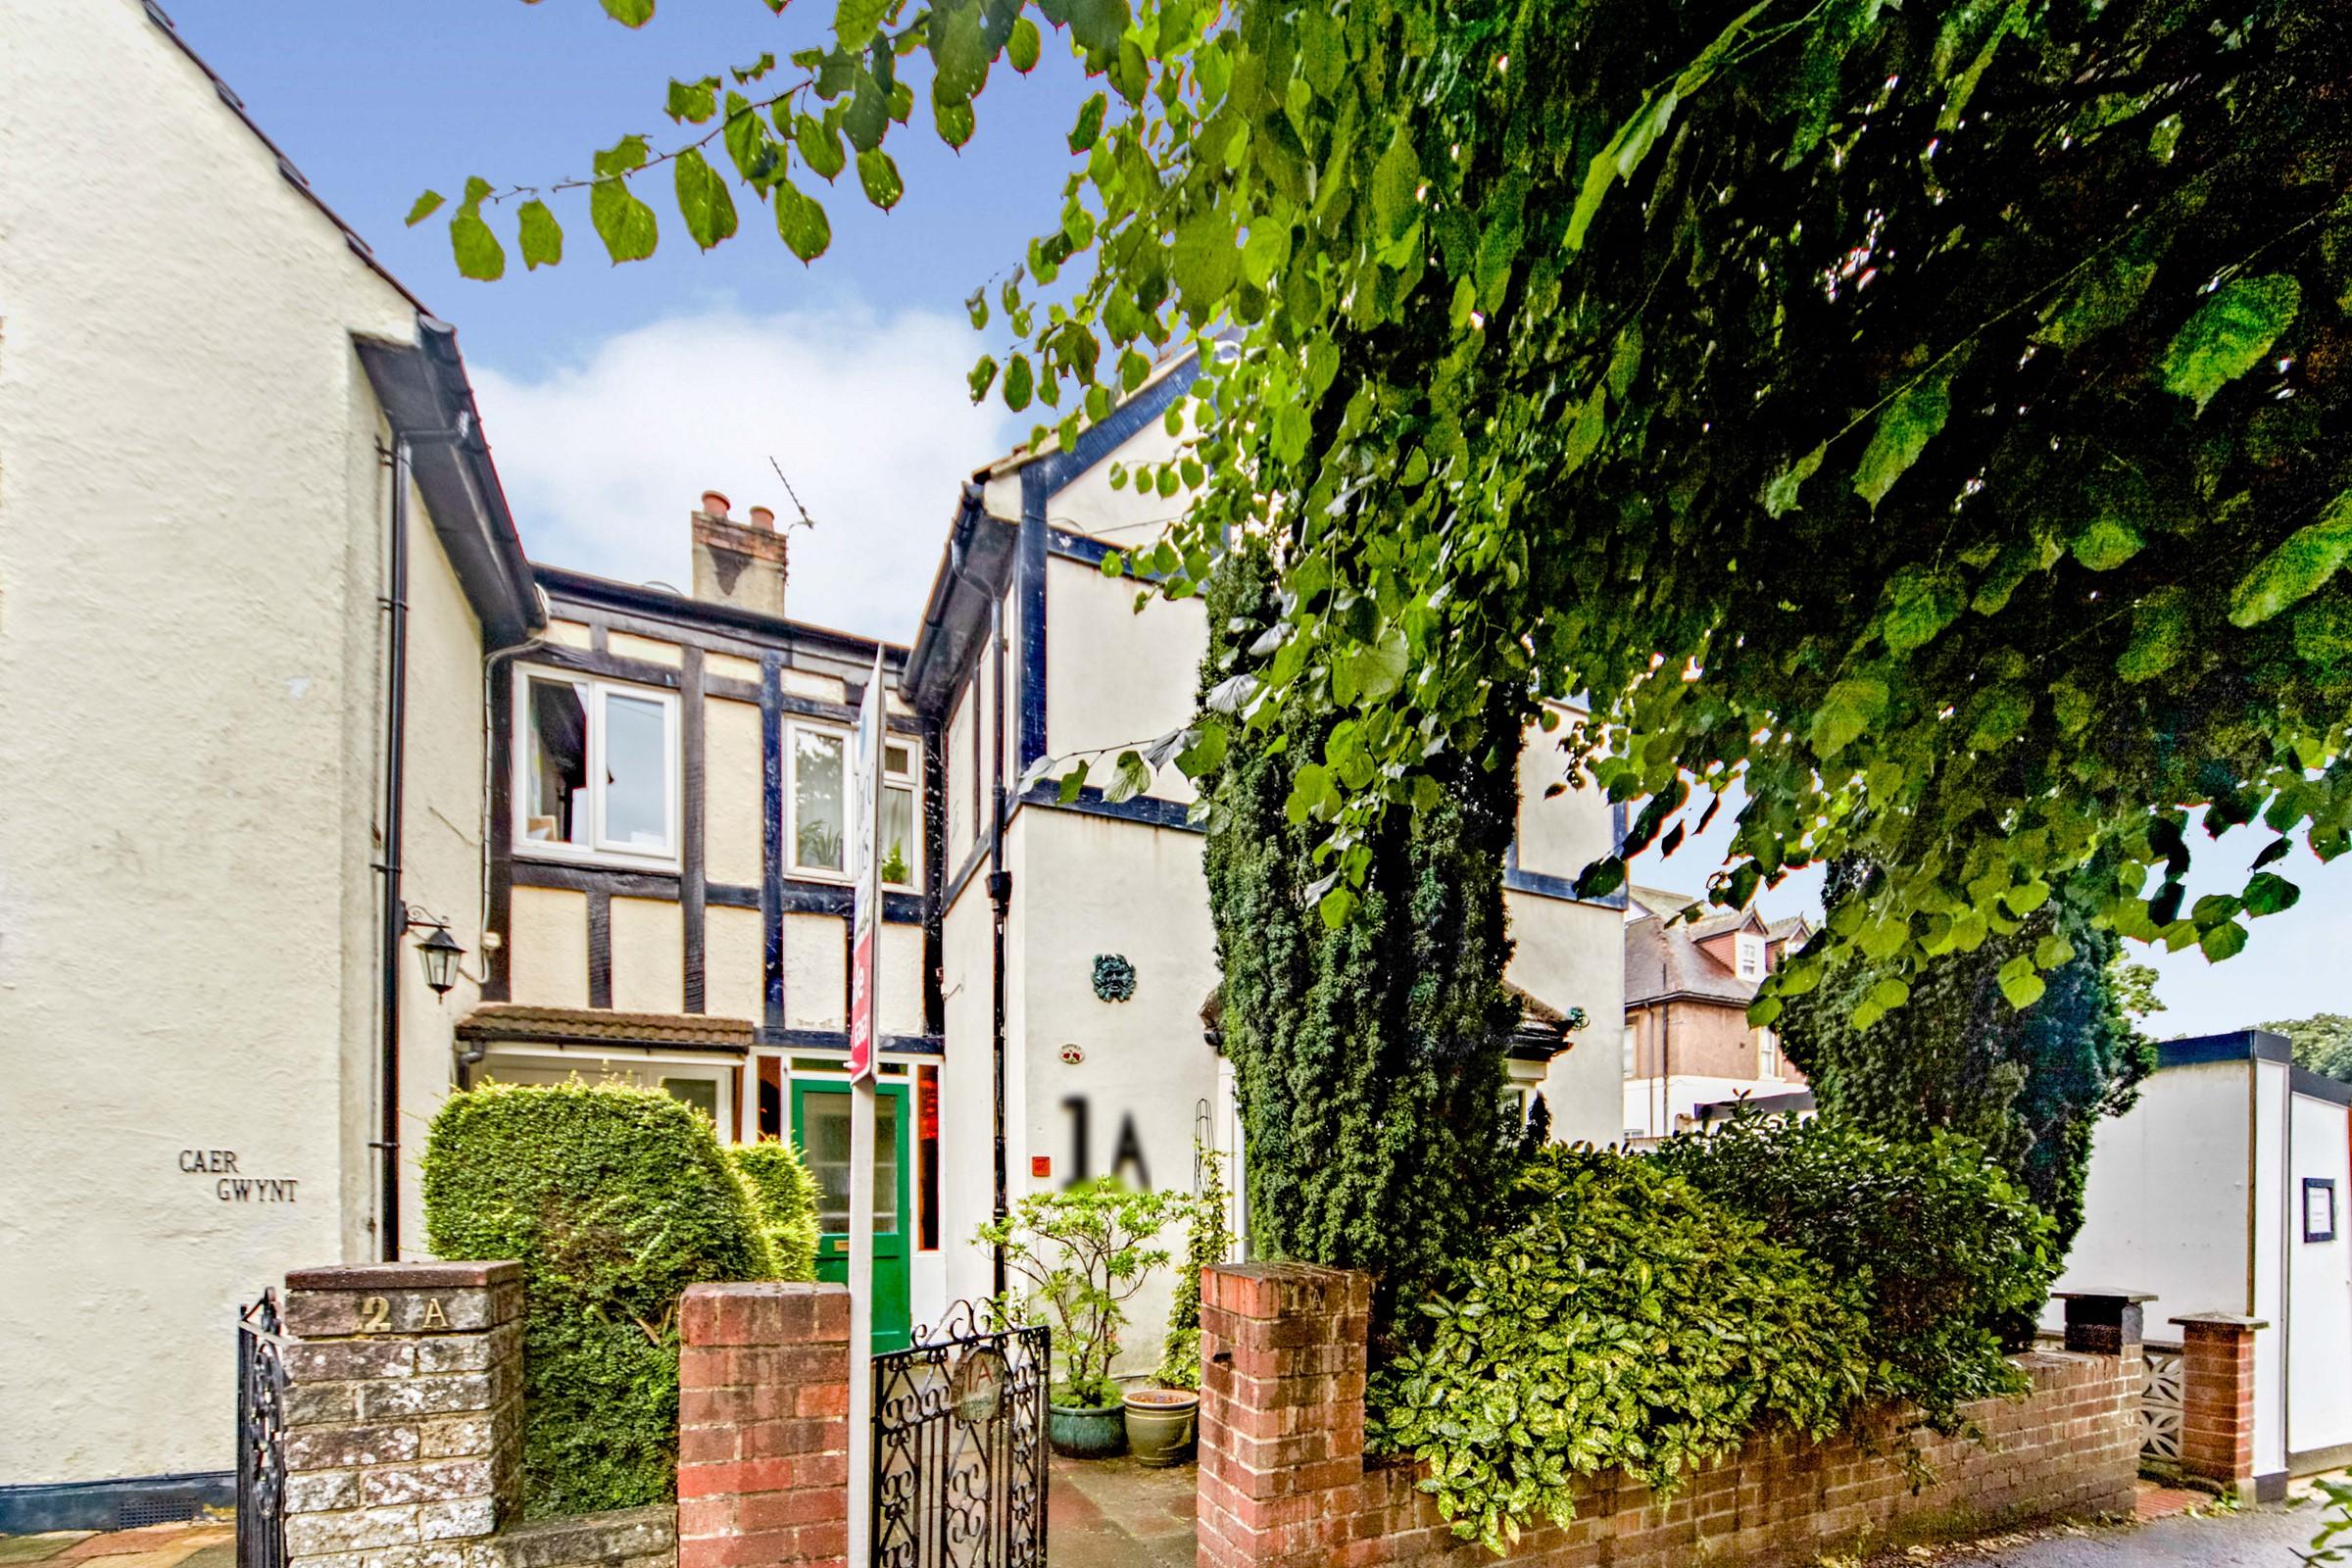 Broomhall Road, South Croydon, Surrey, ., CR2